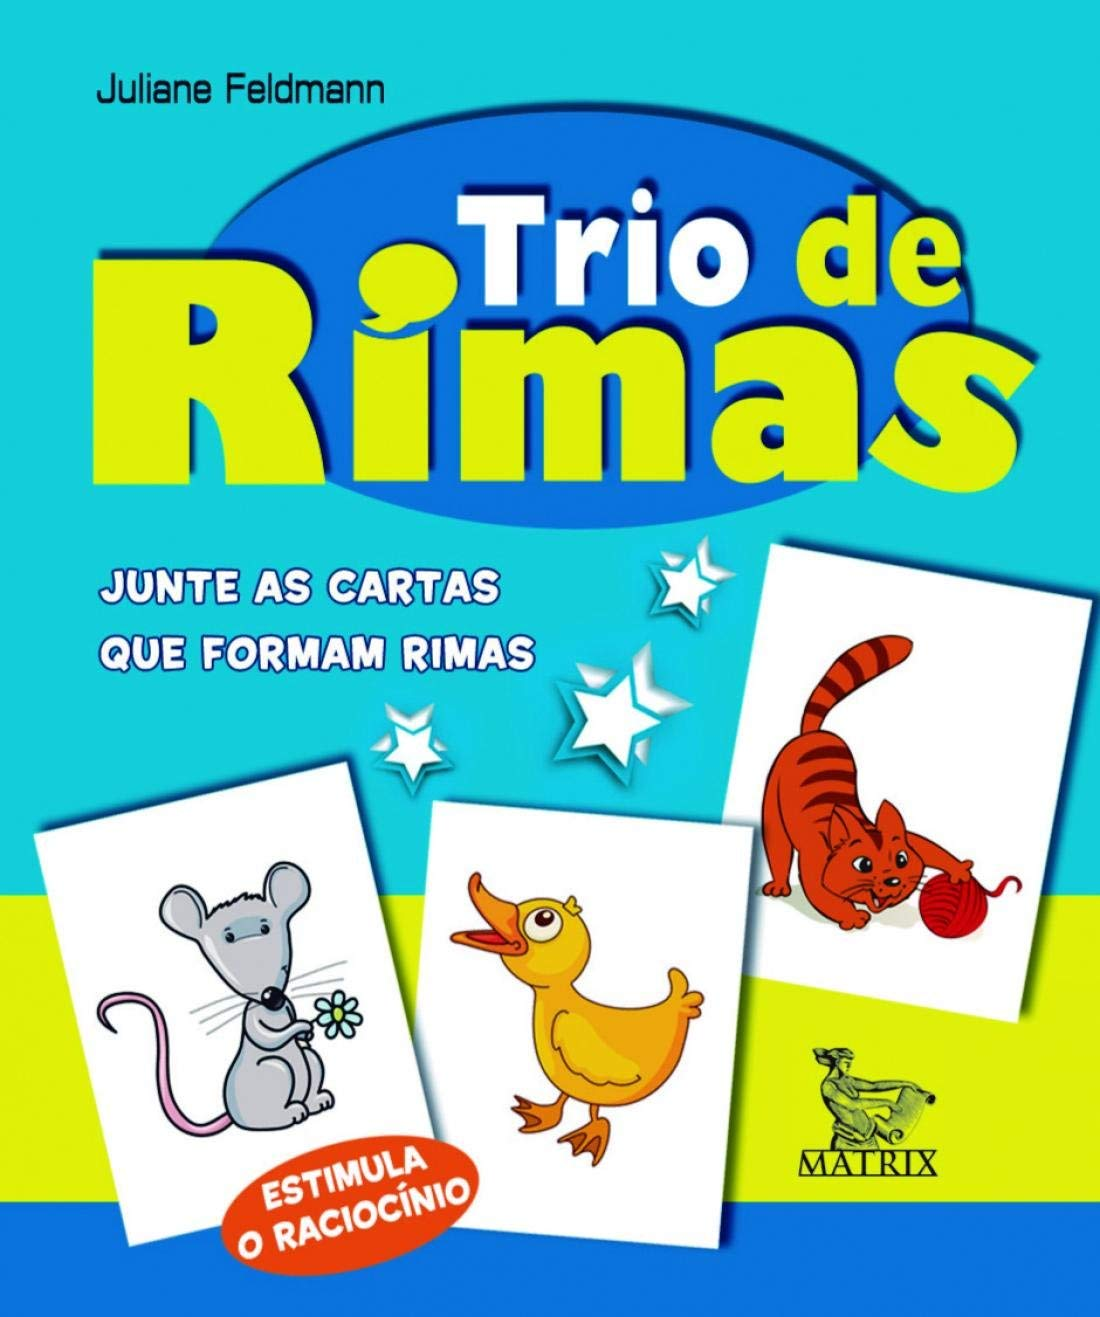 Trio de Rimas: Juliane Fedmann: 9788582301180: Amazon.com: Books